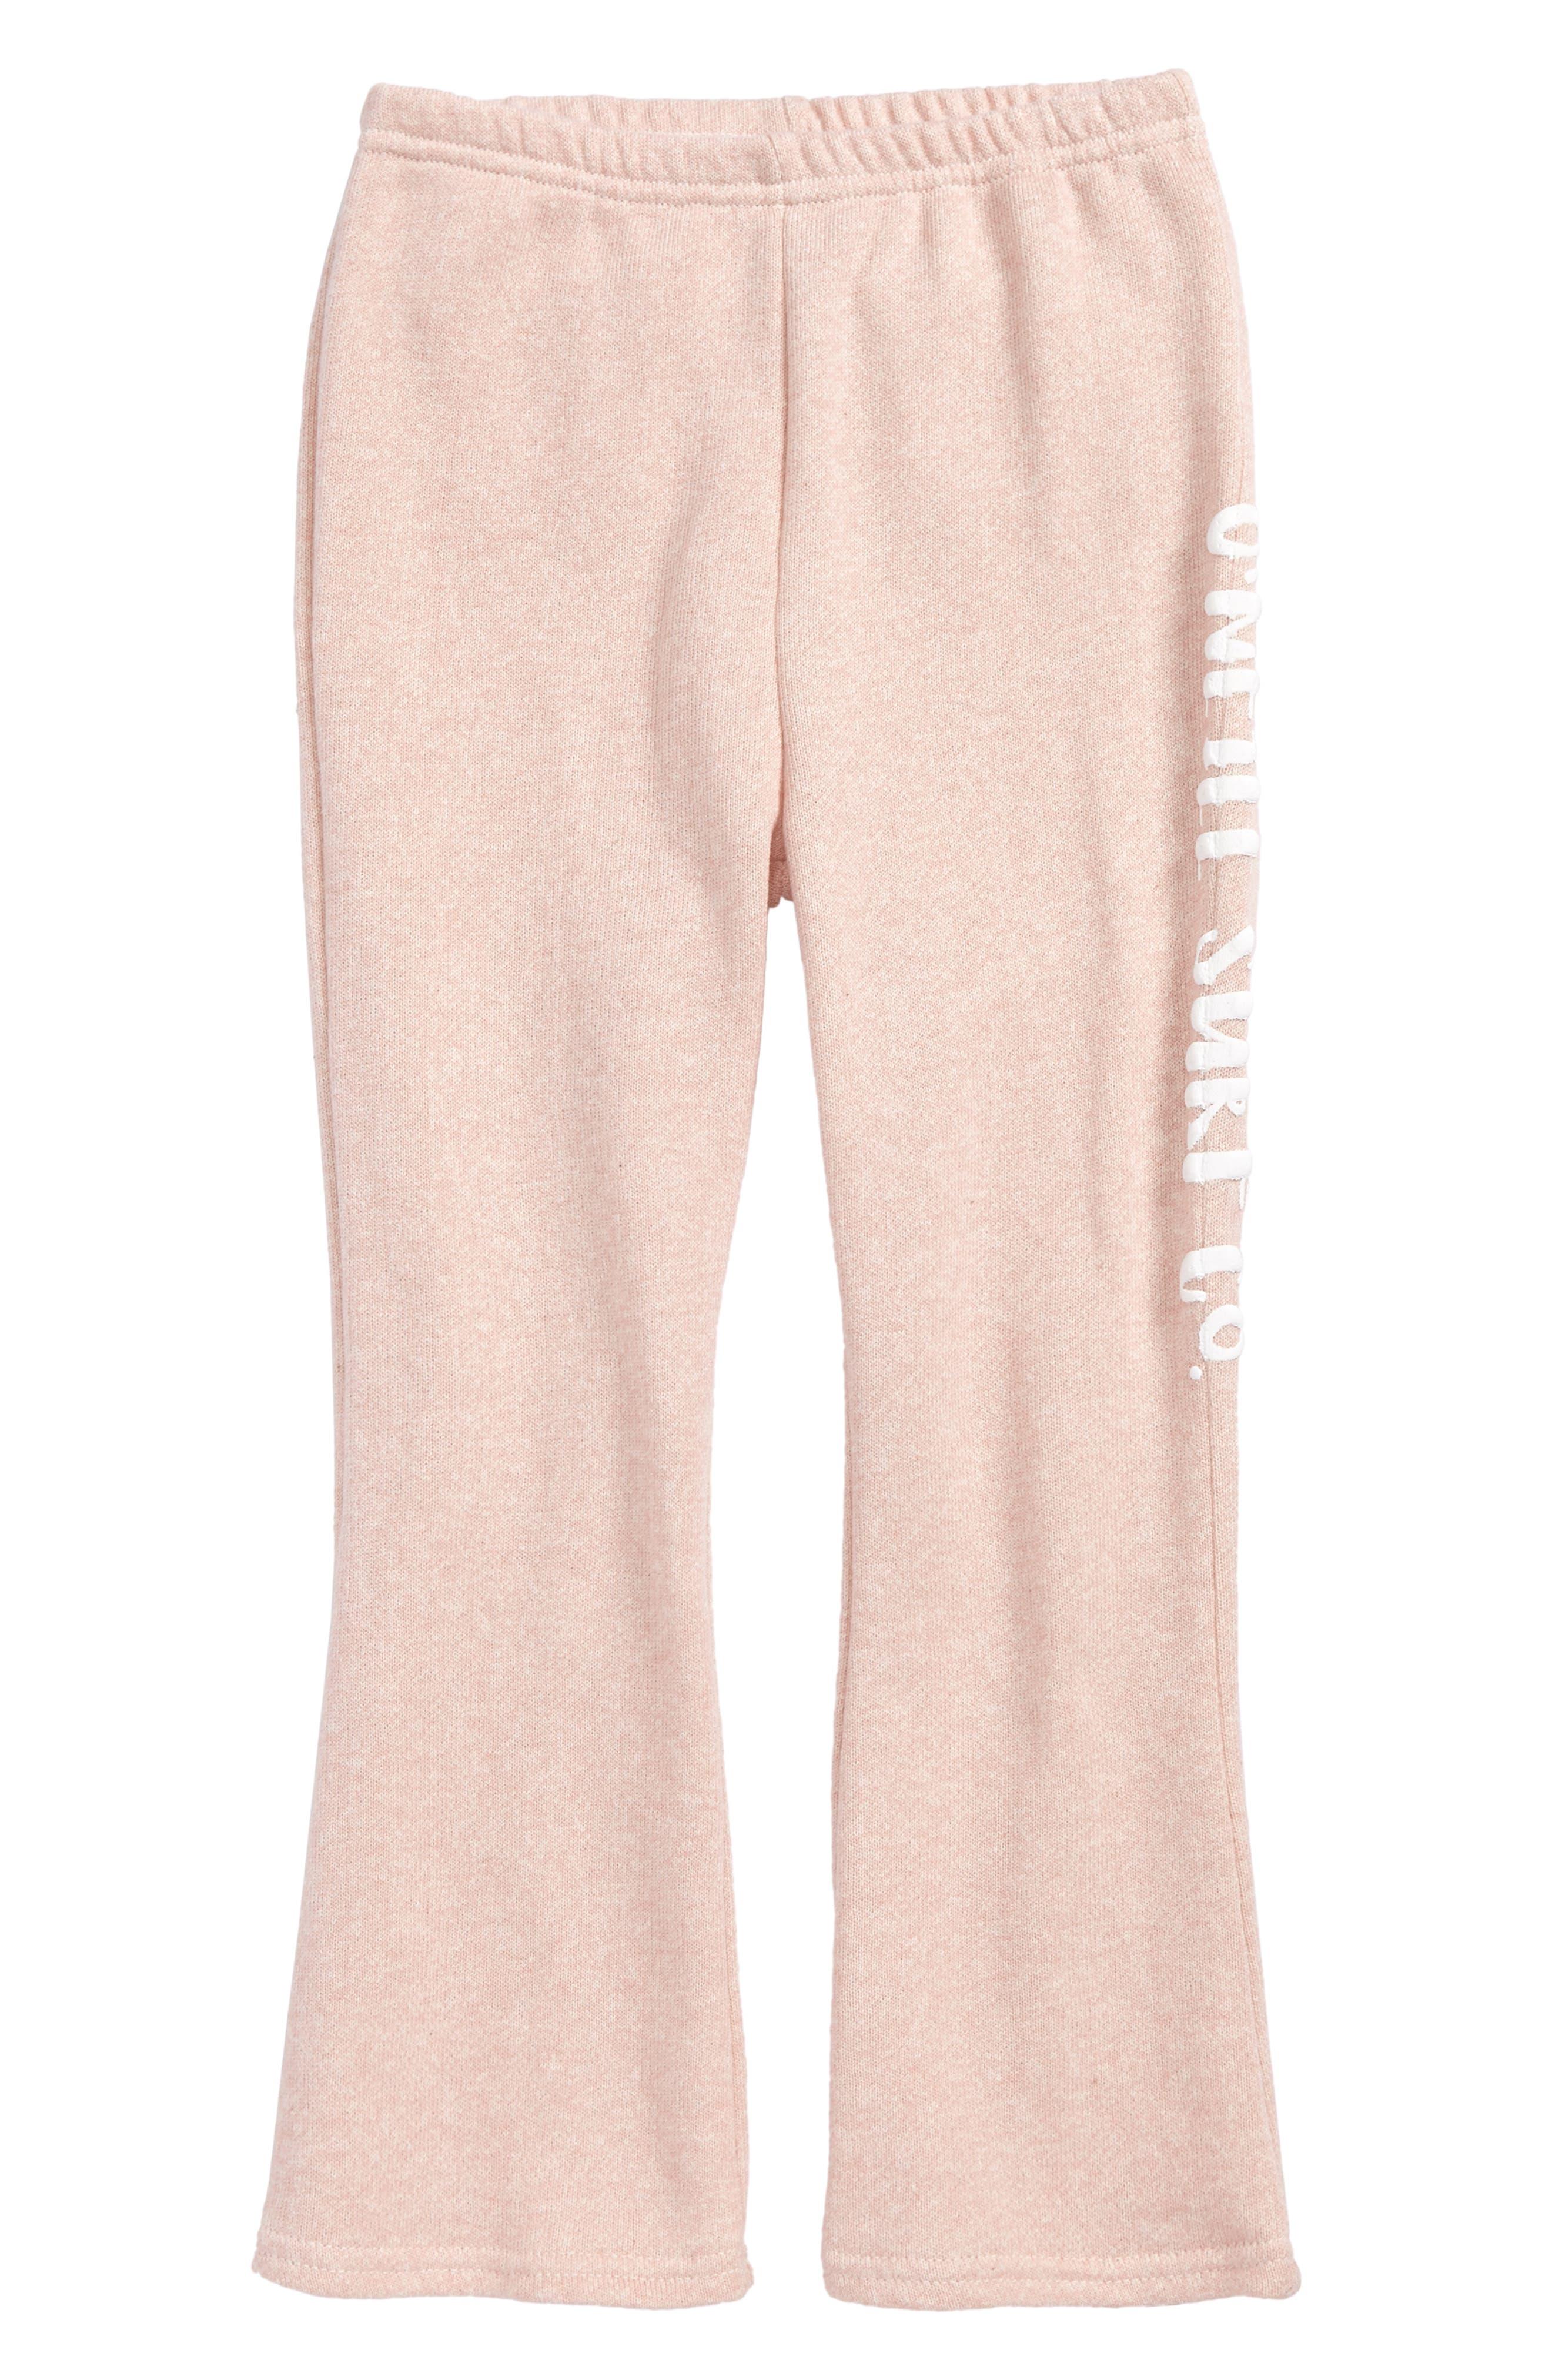 Beach Belle Fleece Pants,                         Main,                         color, Peony